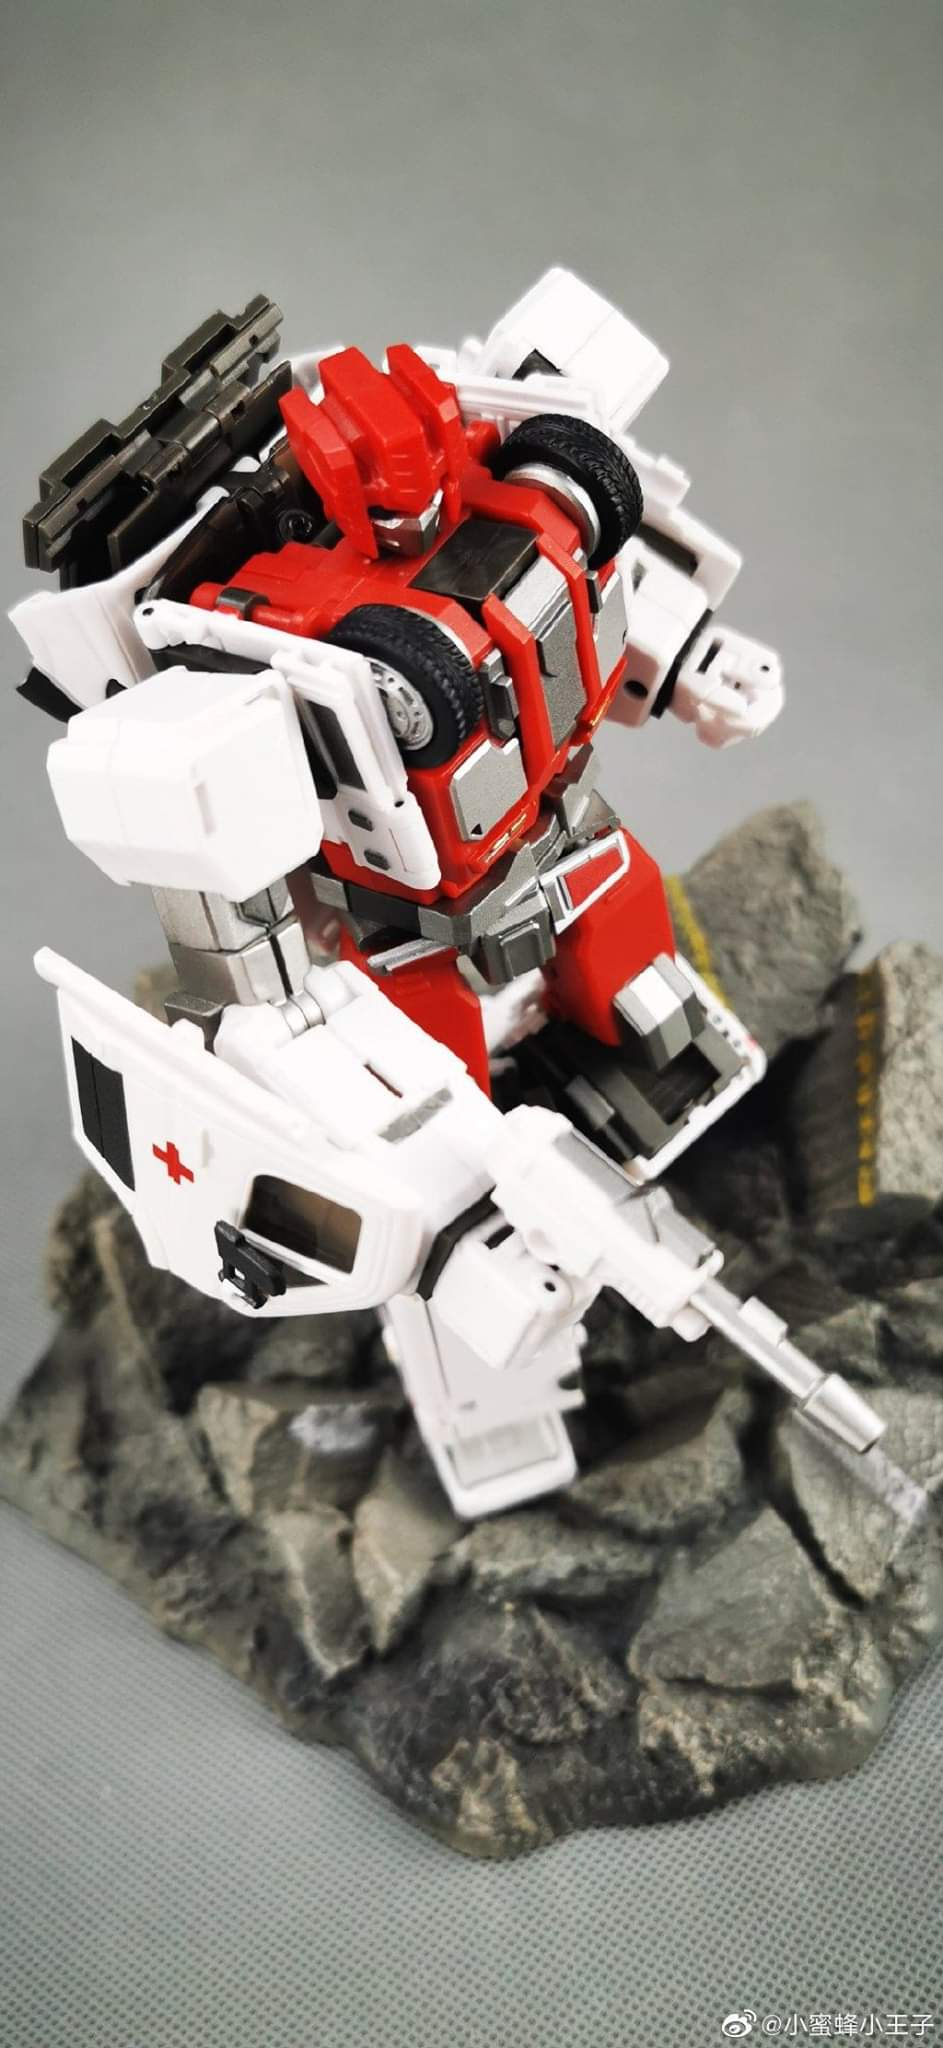 [Generation Toy] Produit Tiers - Jouet GT-08 Guardian - aka Defensor/Defenso - Page 2 Cbj2PeYT_o